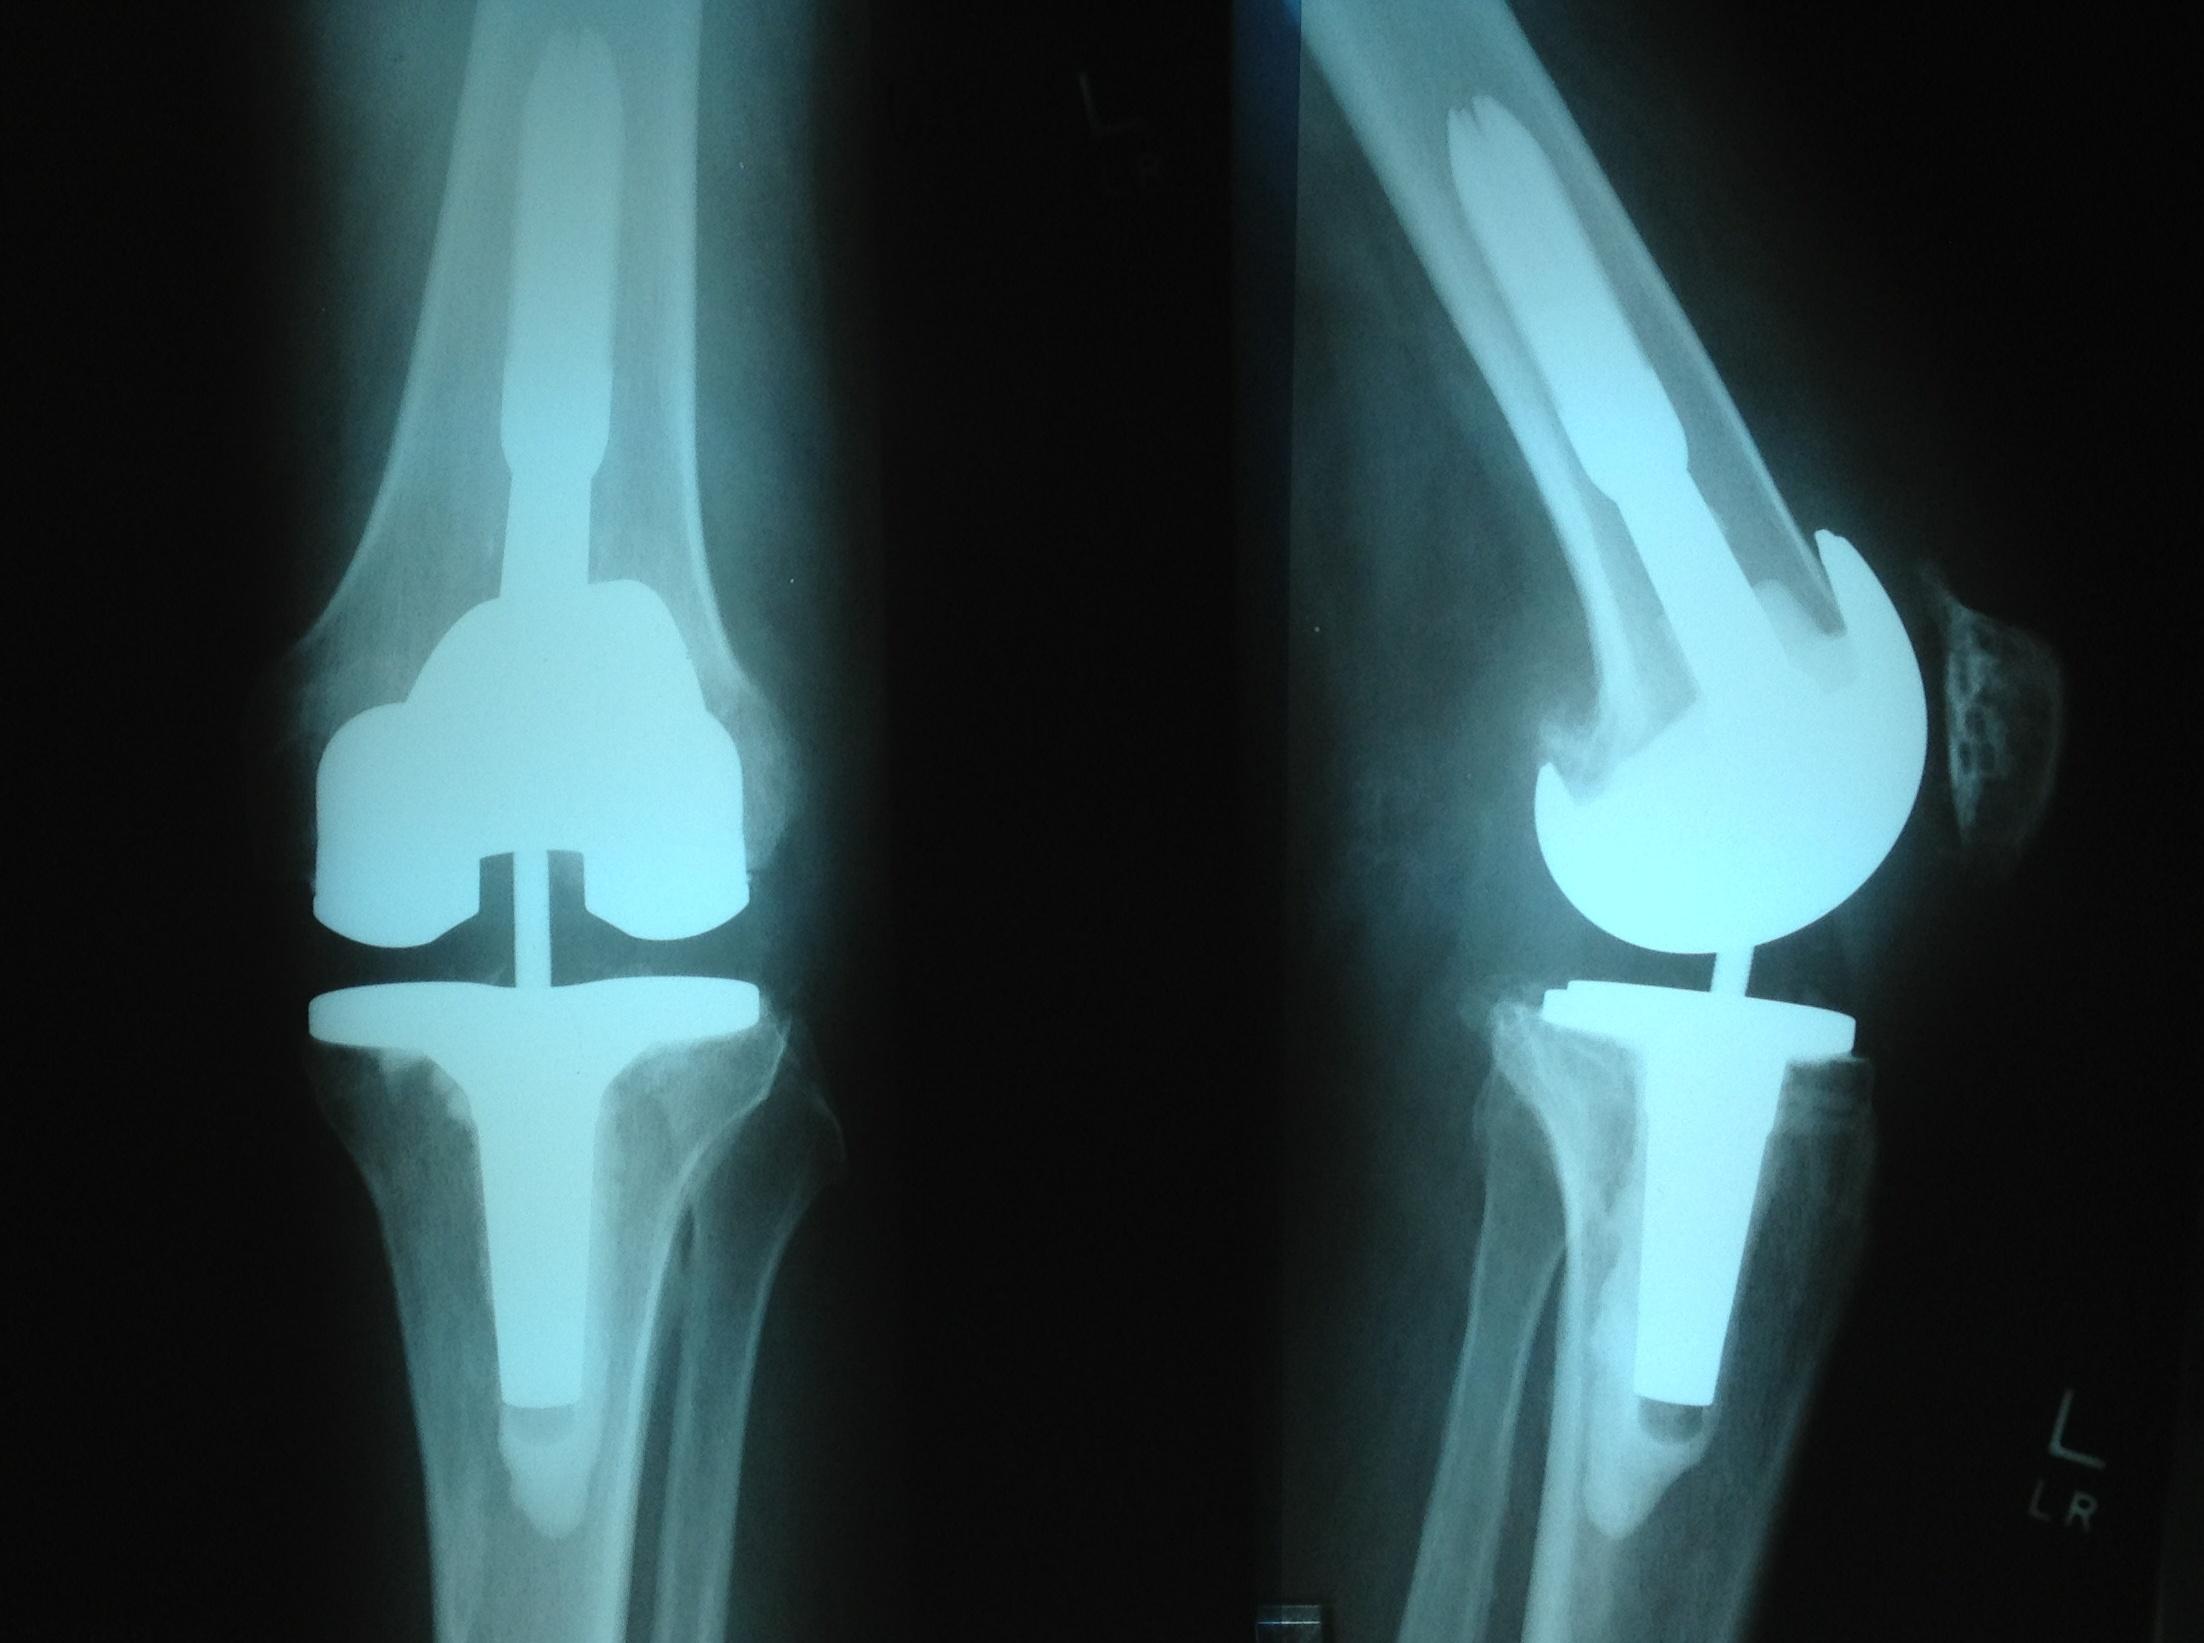 Image result for घुटने बदलवाने